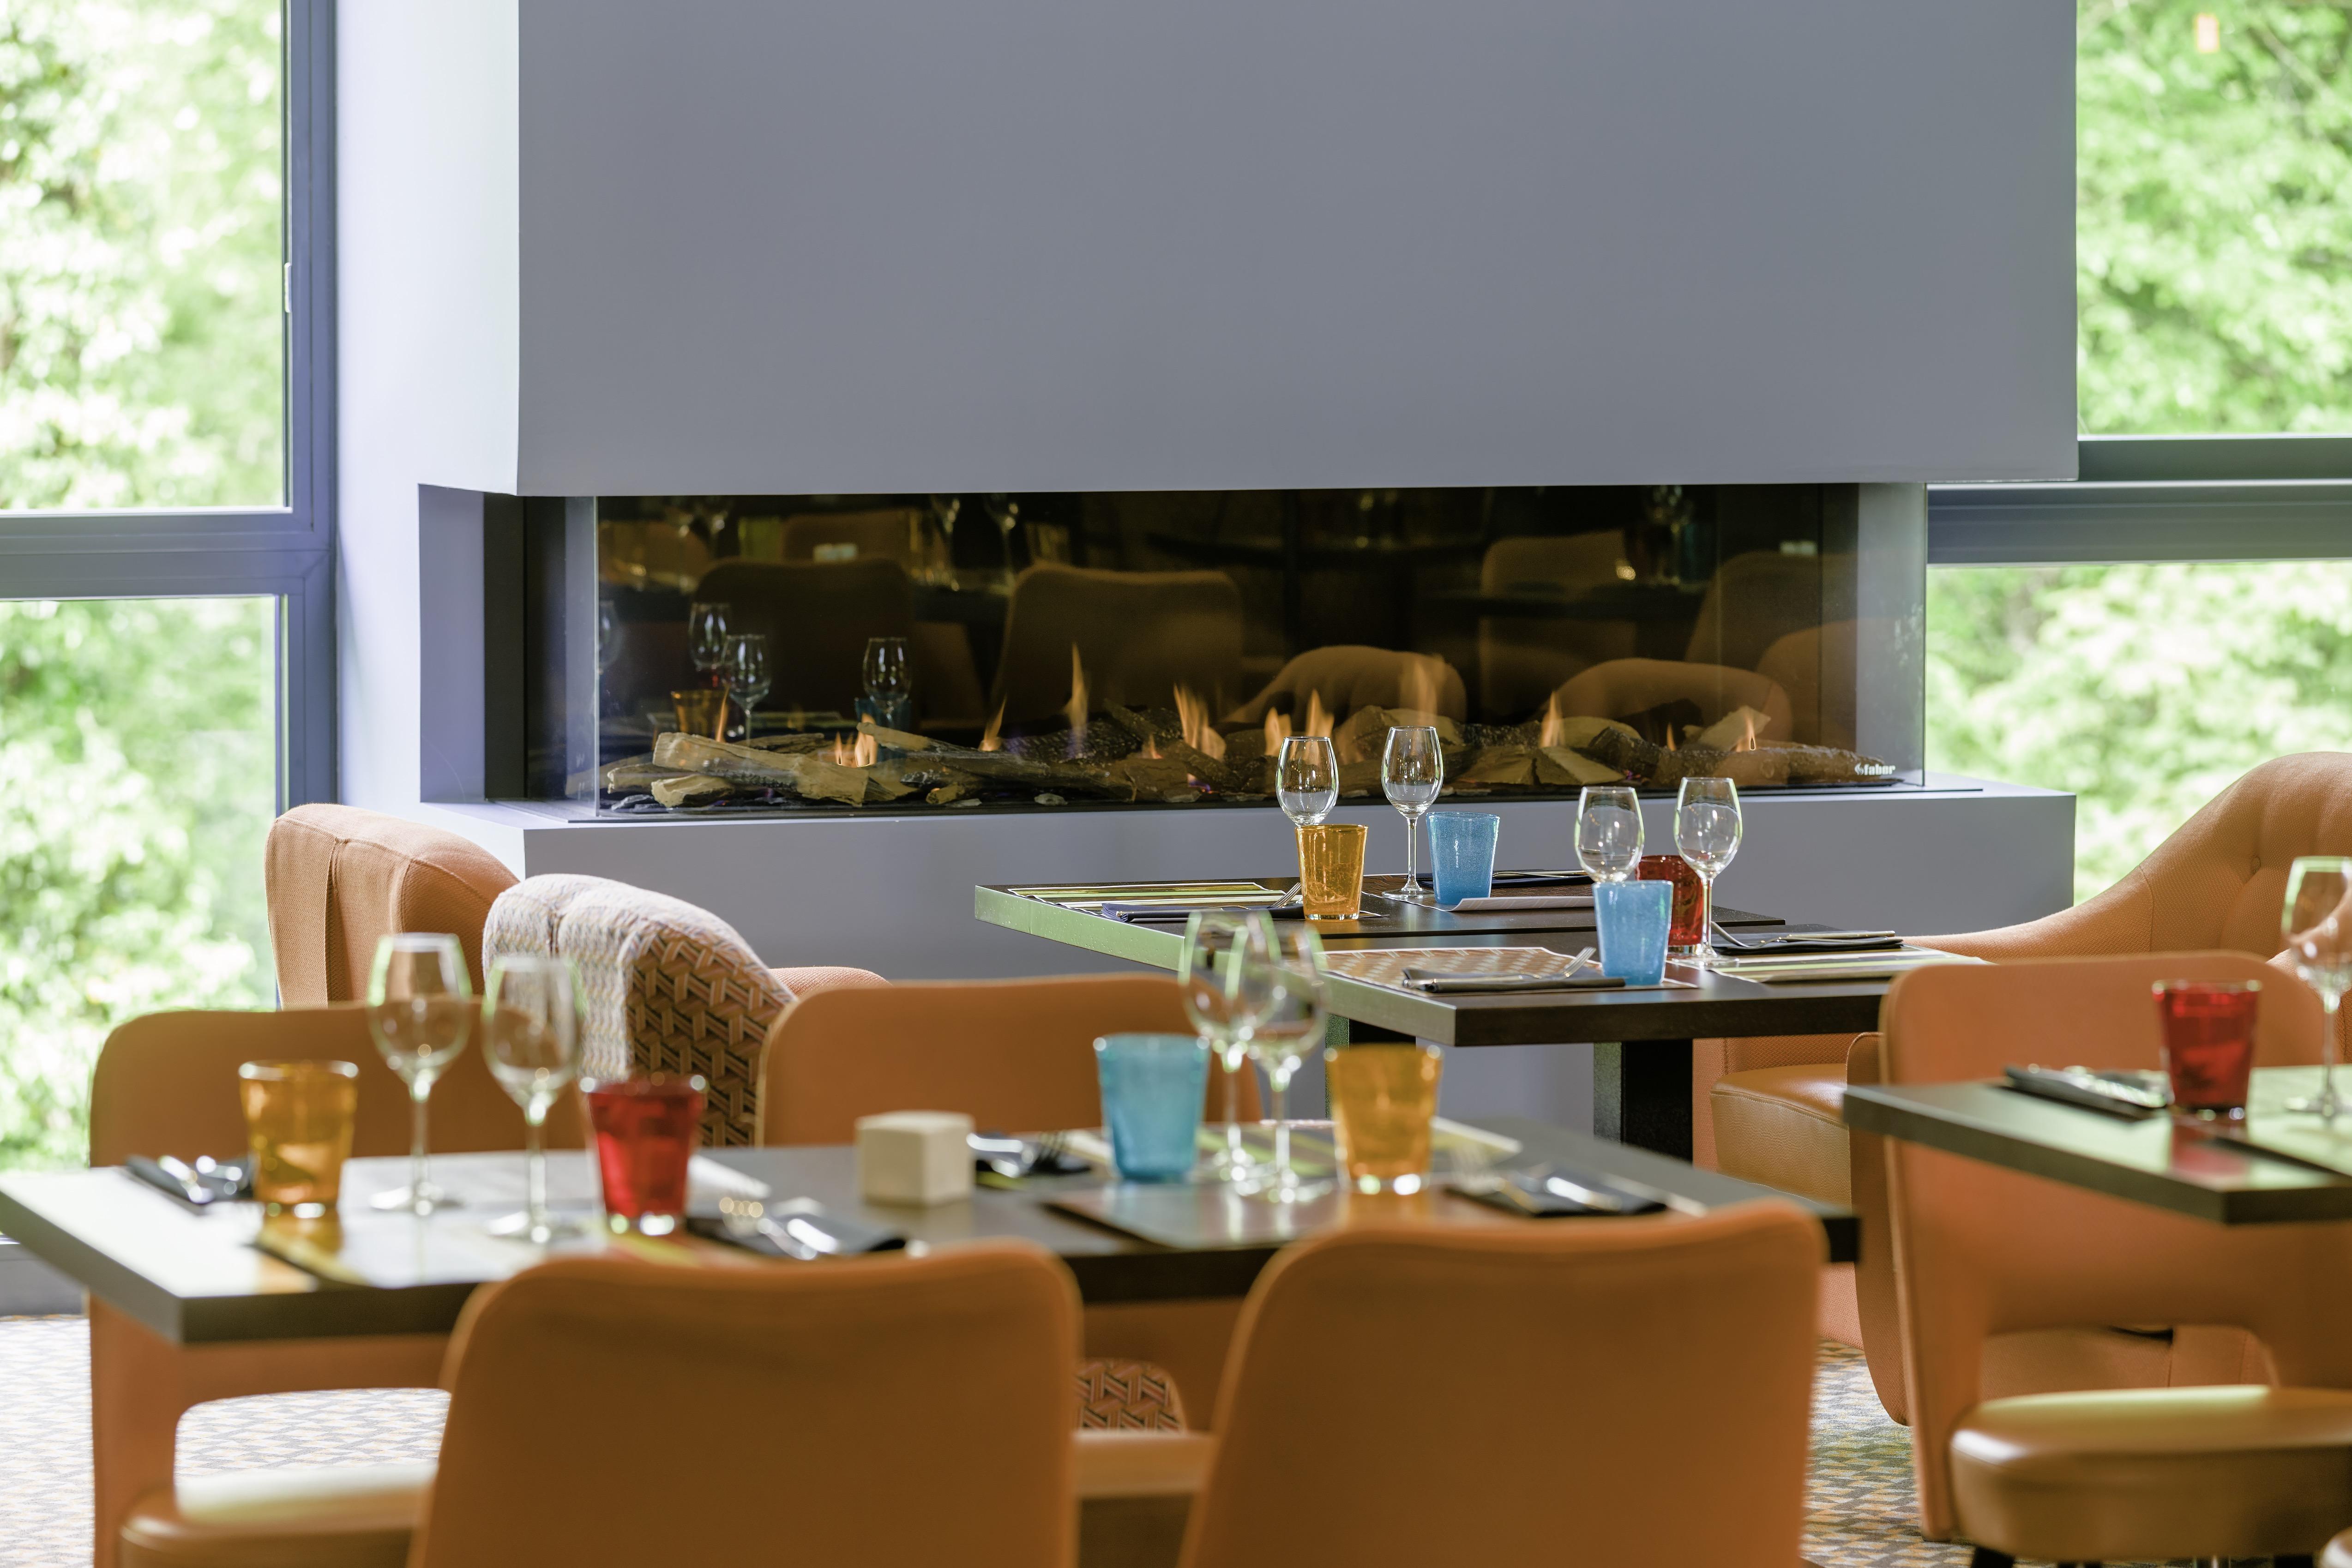 restaurant la romana lons le saunier. Black Bedroom Furniture Sets. Home Design Ideas